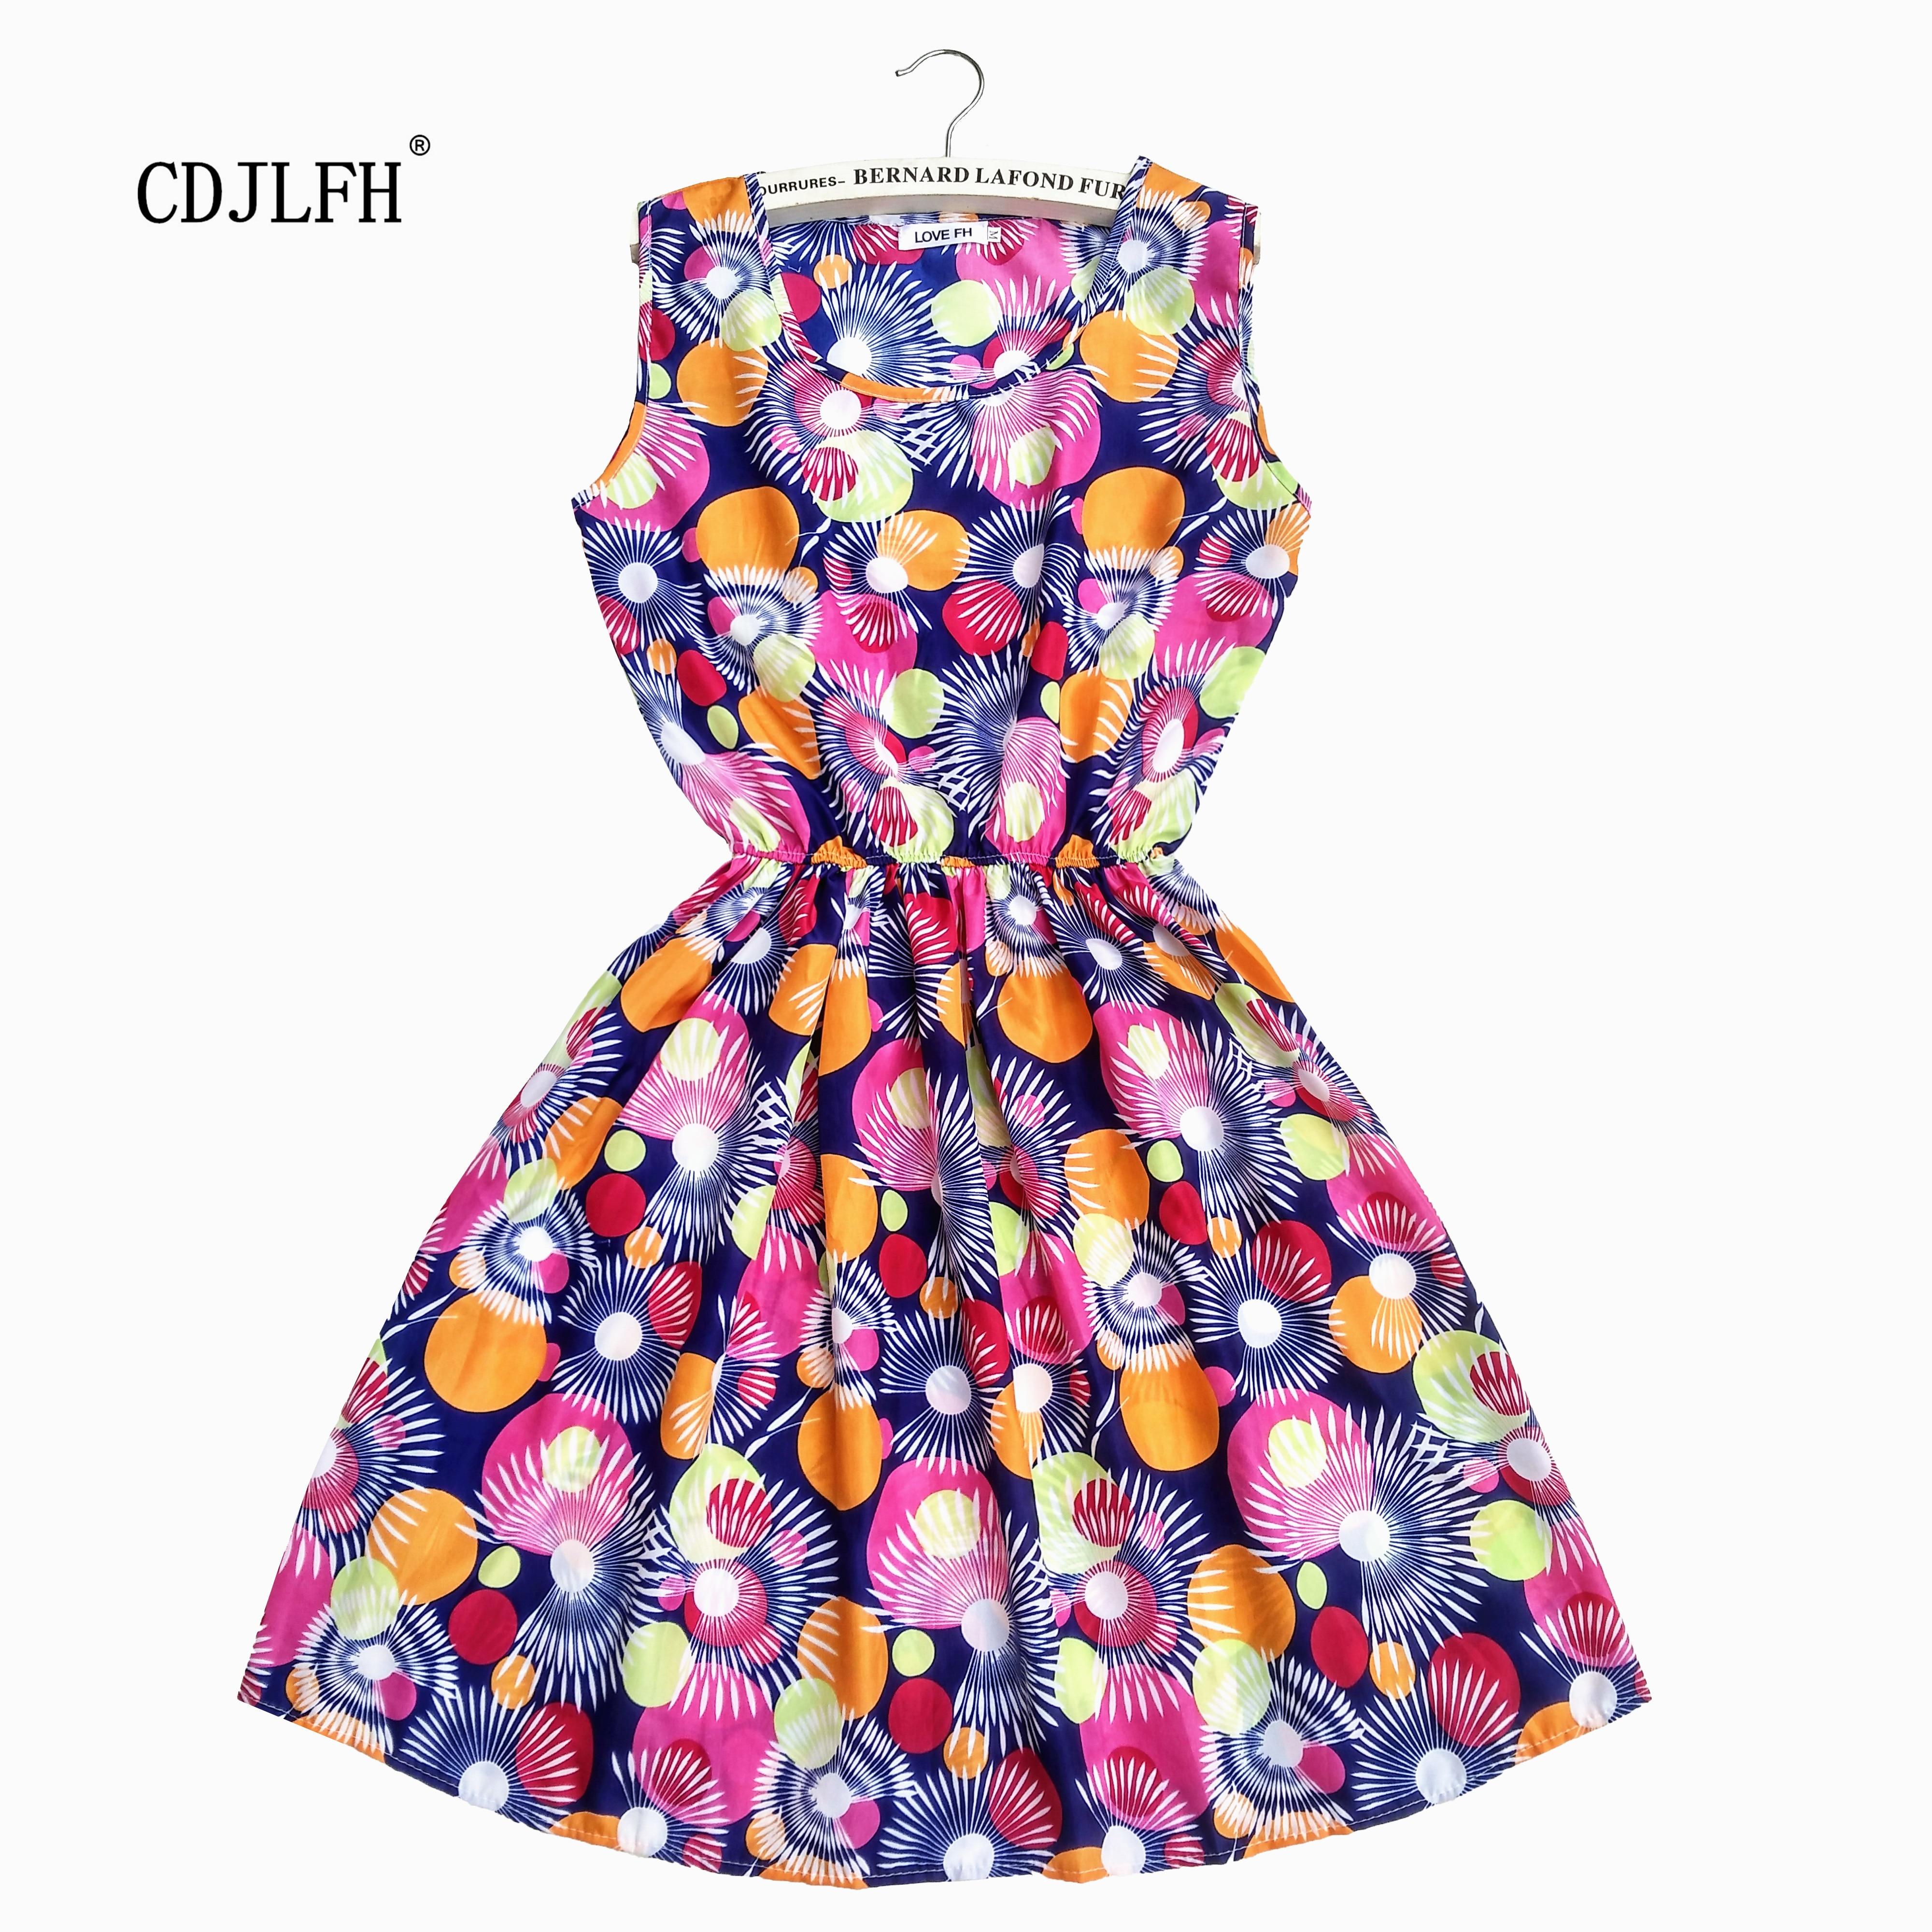 CDJLFH Summer Women Beach Dress Floral Printed Chiffon